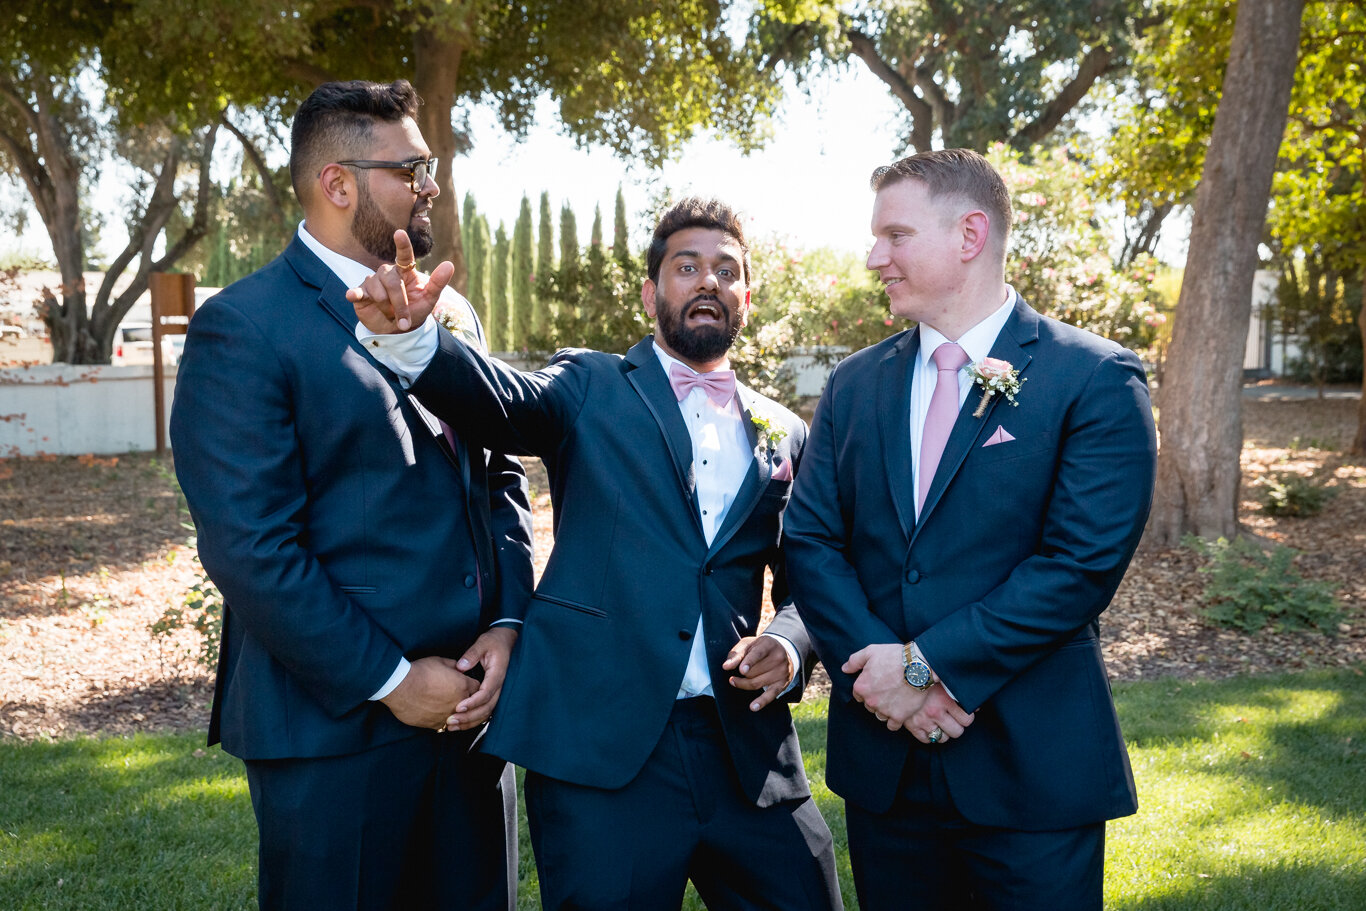 2019.08.24_Emily-Ashir-Wedding-at-the-Maples-5608.jpg